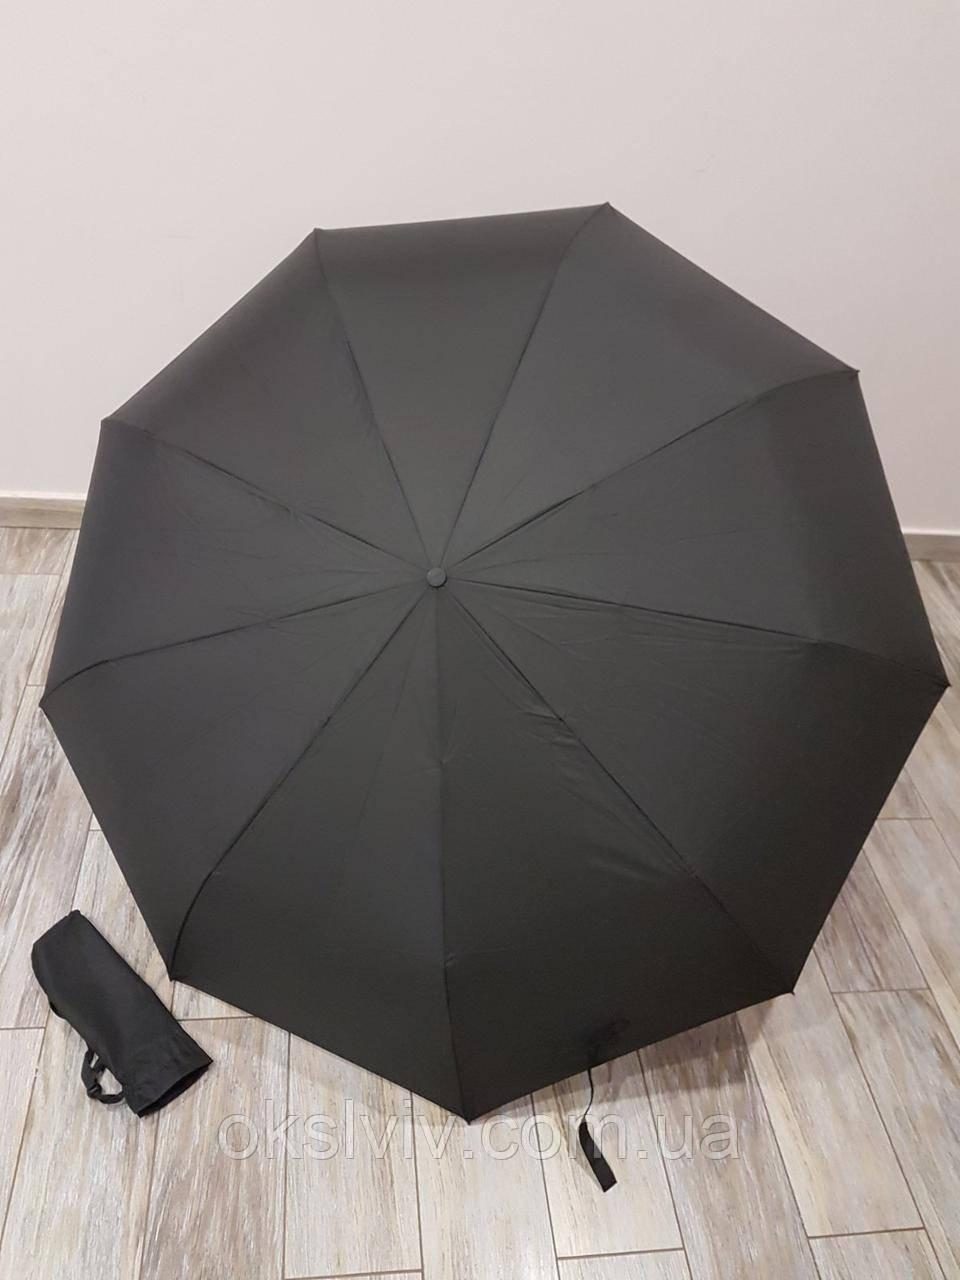 LANTANA парасоля зонт сімейна повний автомат